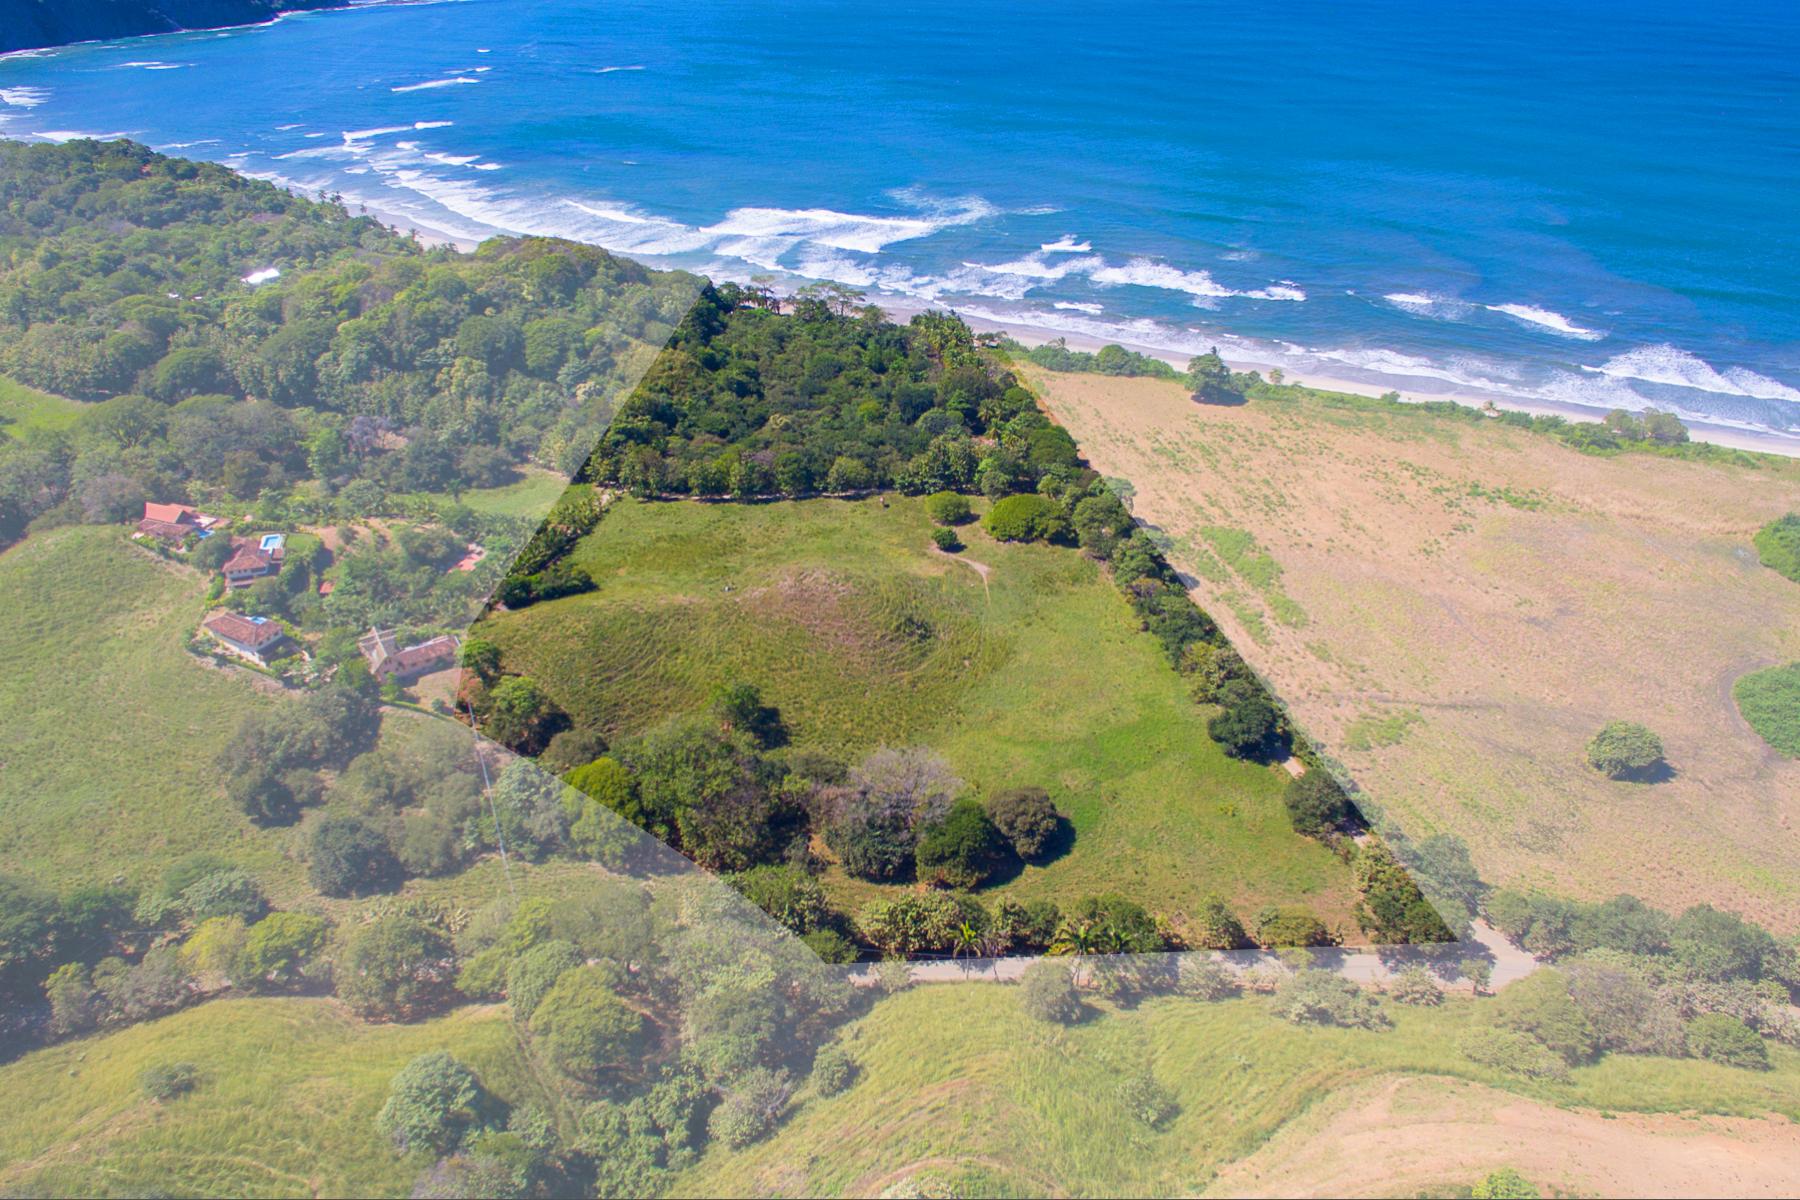 Terrain pour l Vente à Armonia Montañosa en la playa Nicoya, Guanacaste, Costa Rica